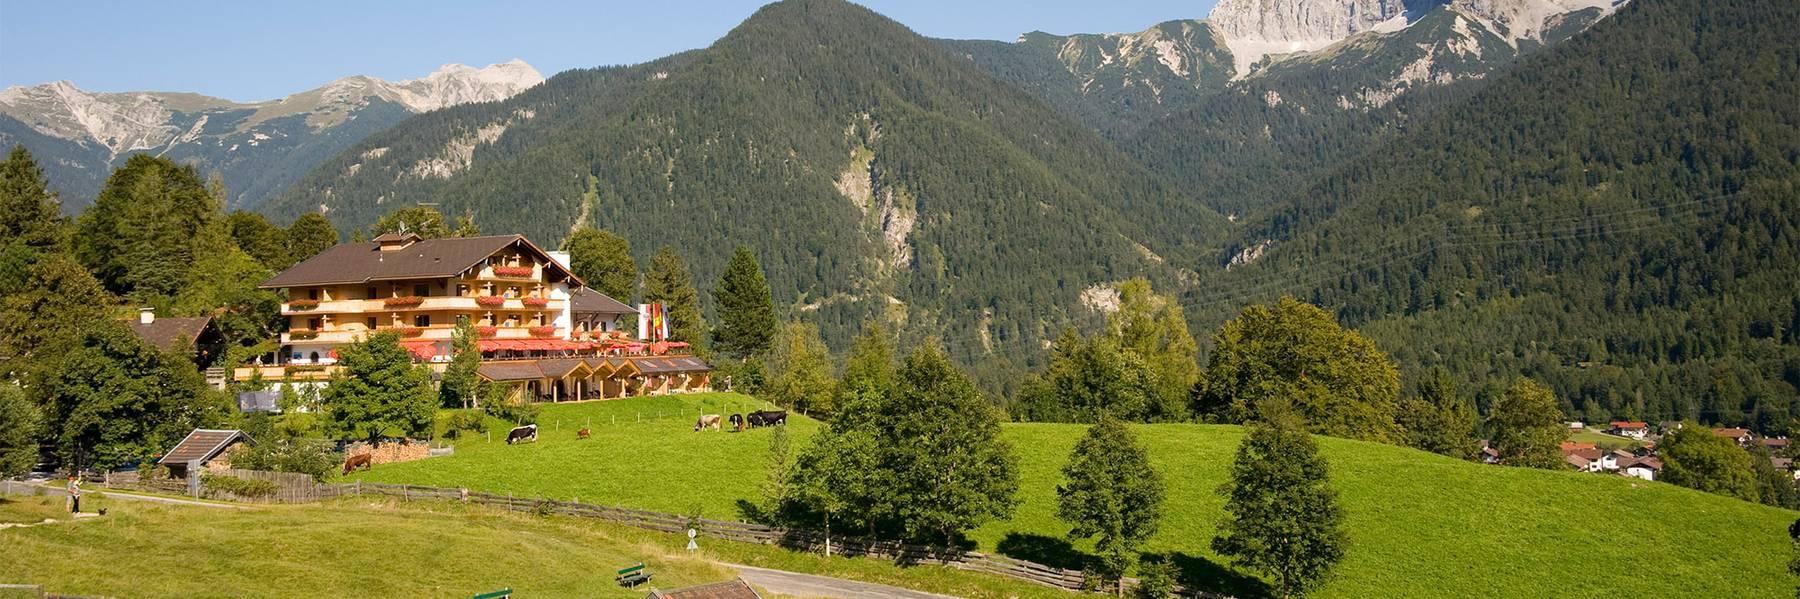 Alpengasthof Hotel Gröbl-Alm in Mittenwald